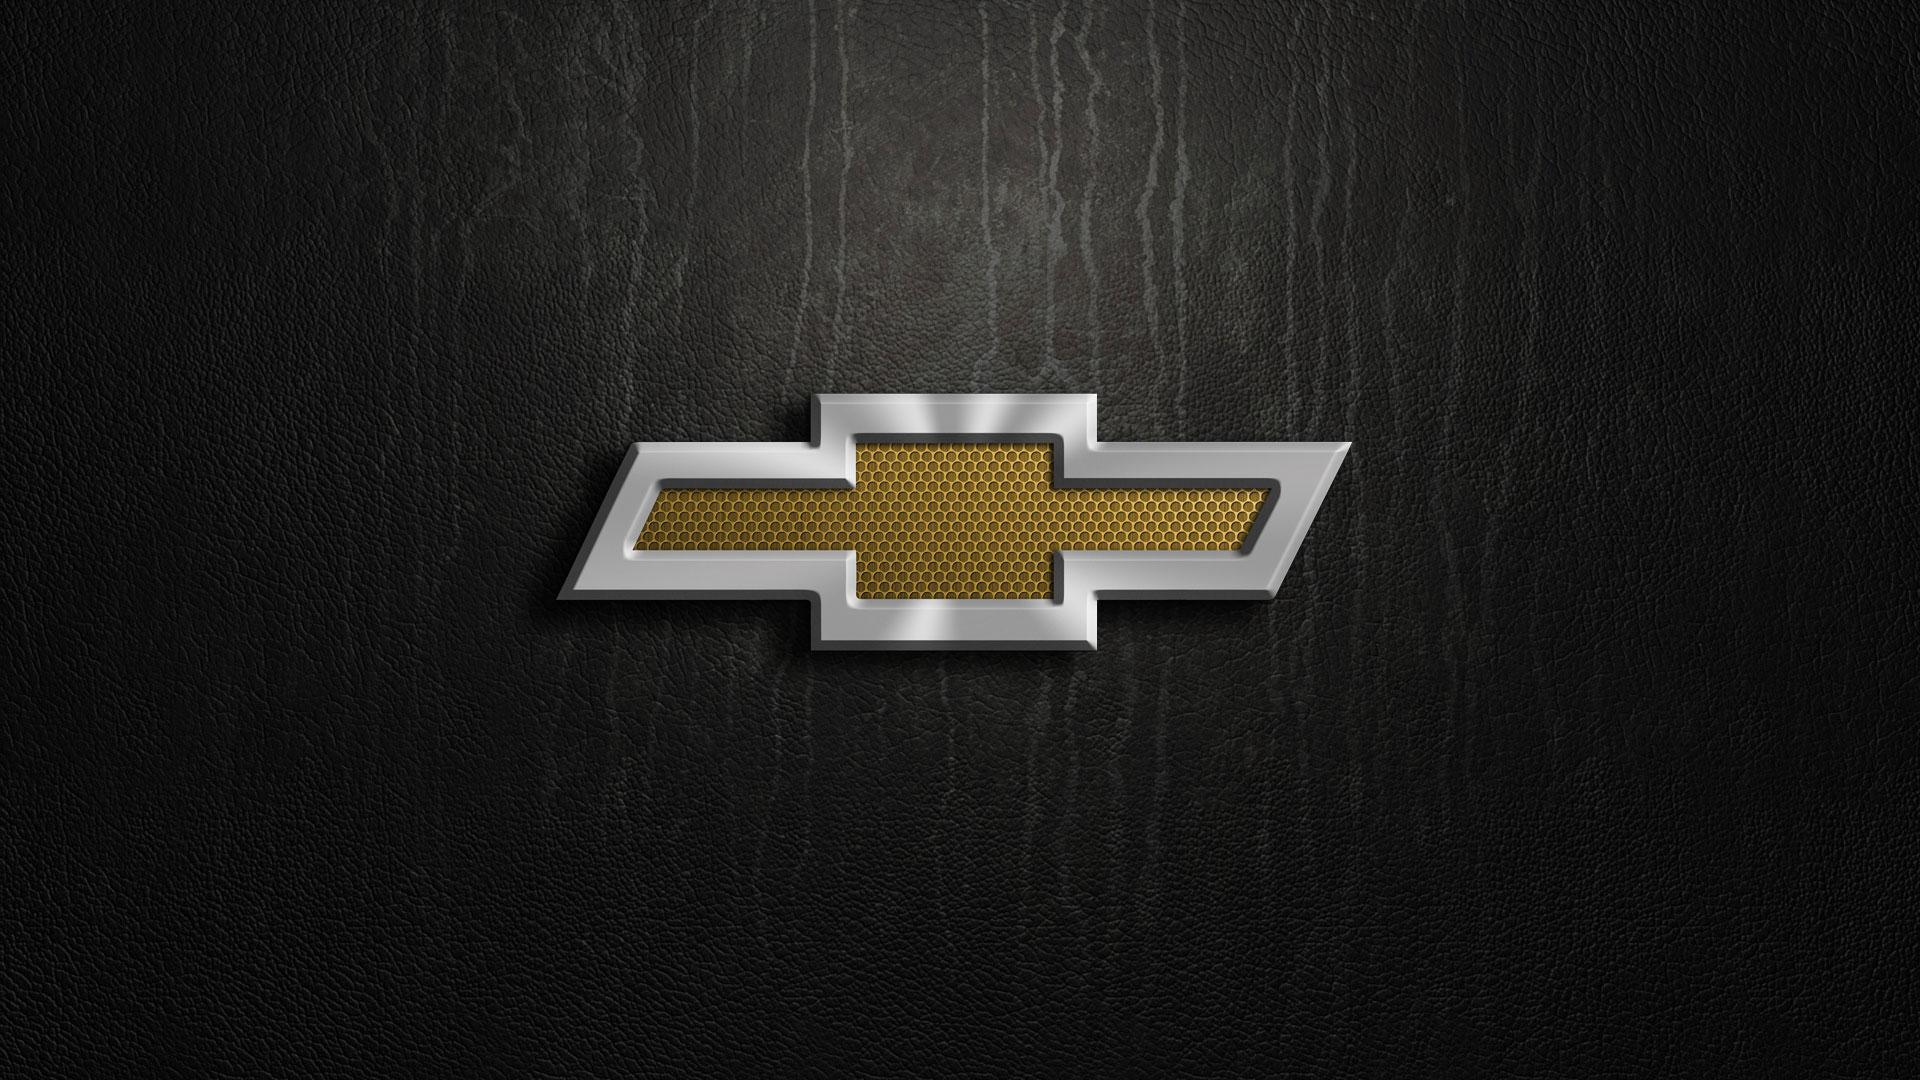 Chevy Wallpaper